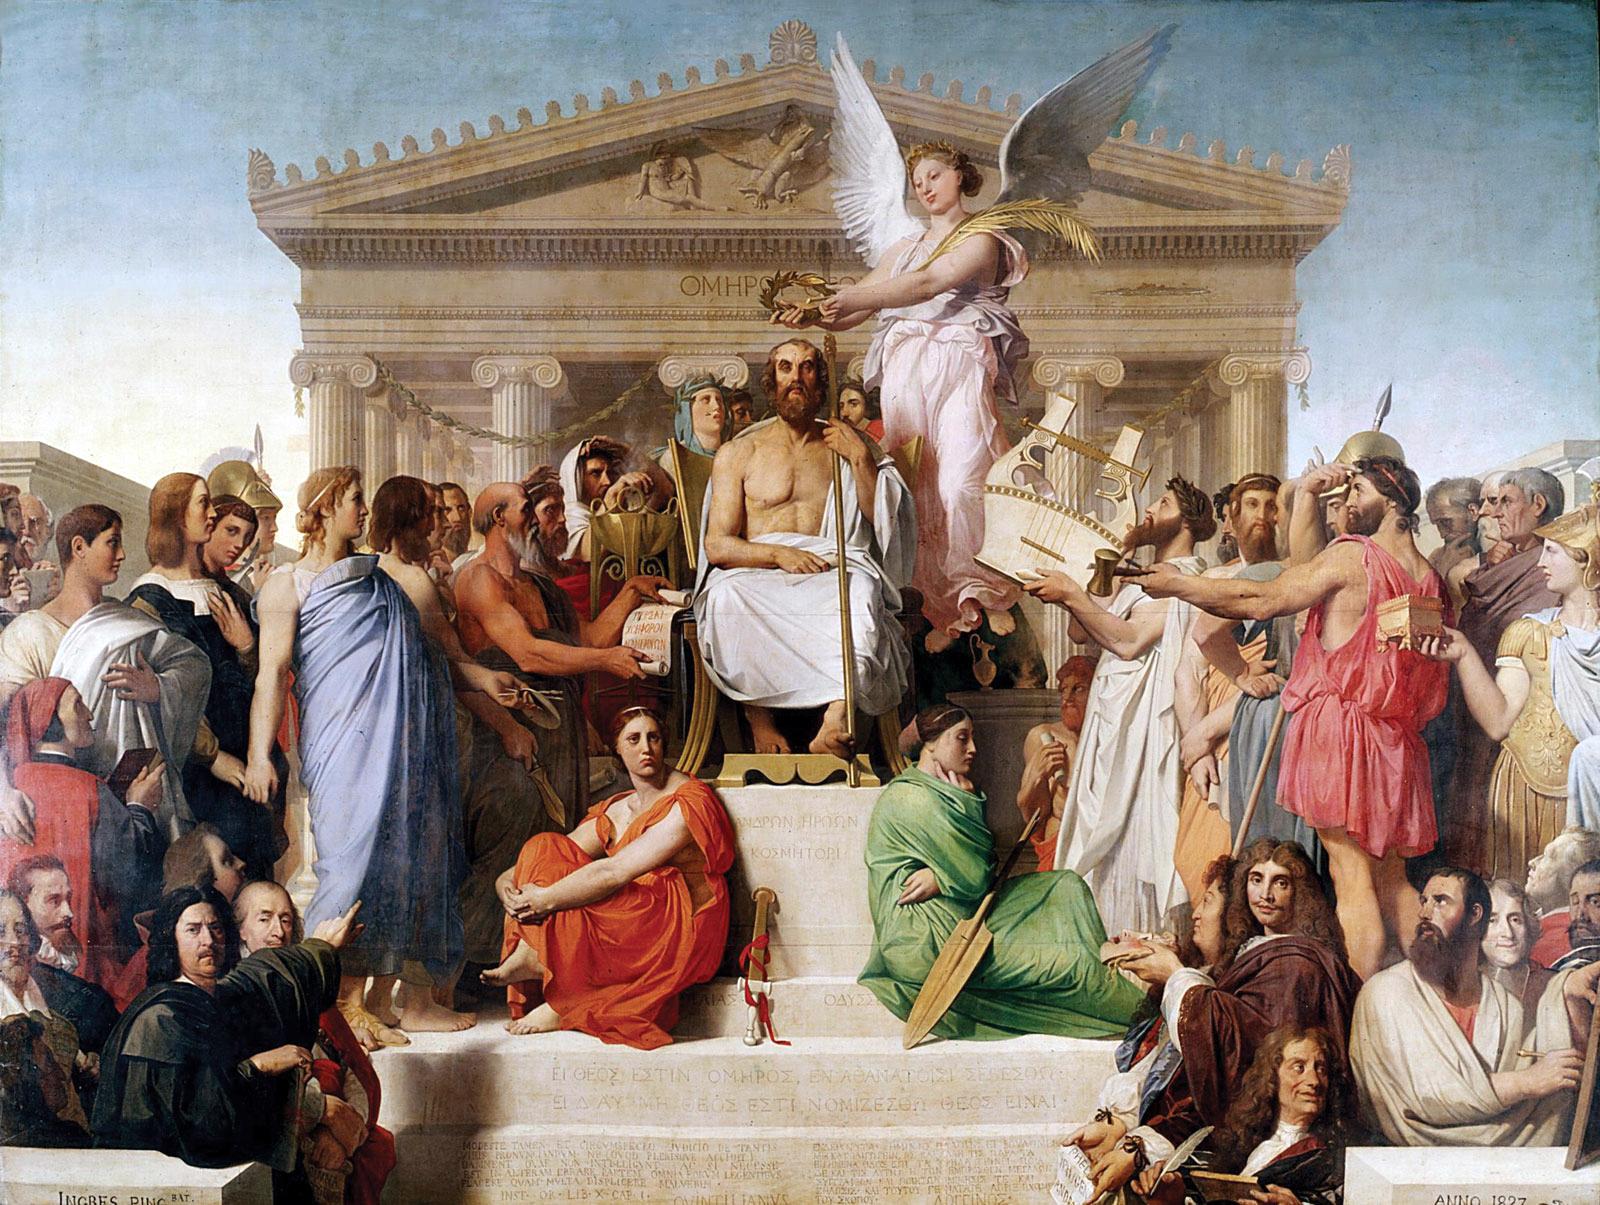 Jean_Auguste_Dominique_Ingres_Apotheosis_of_Homer_1827.jpg